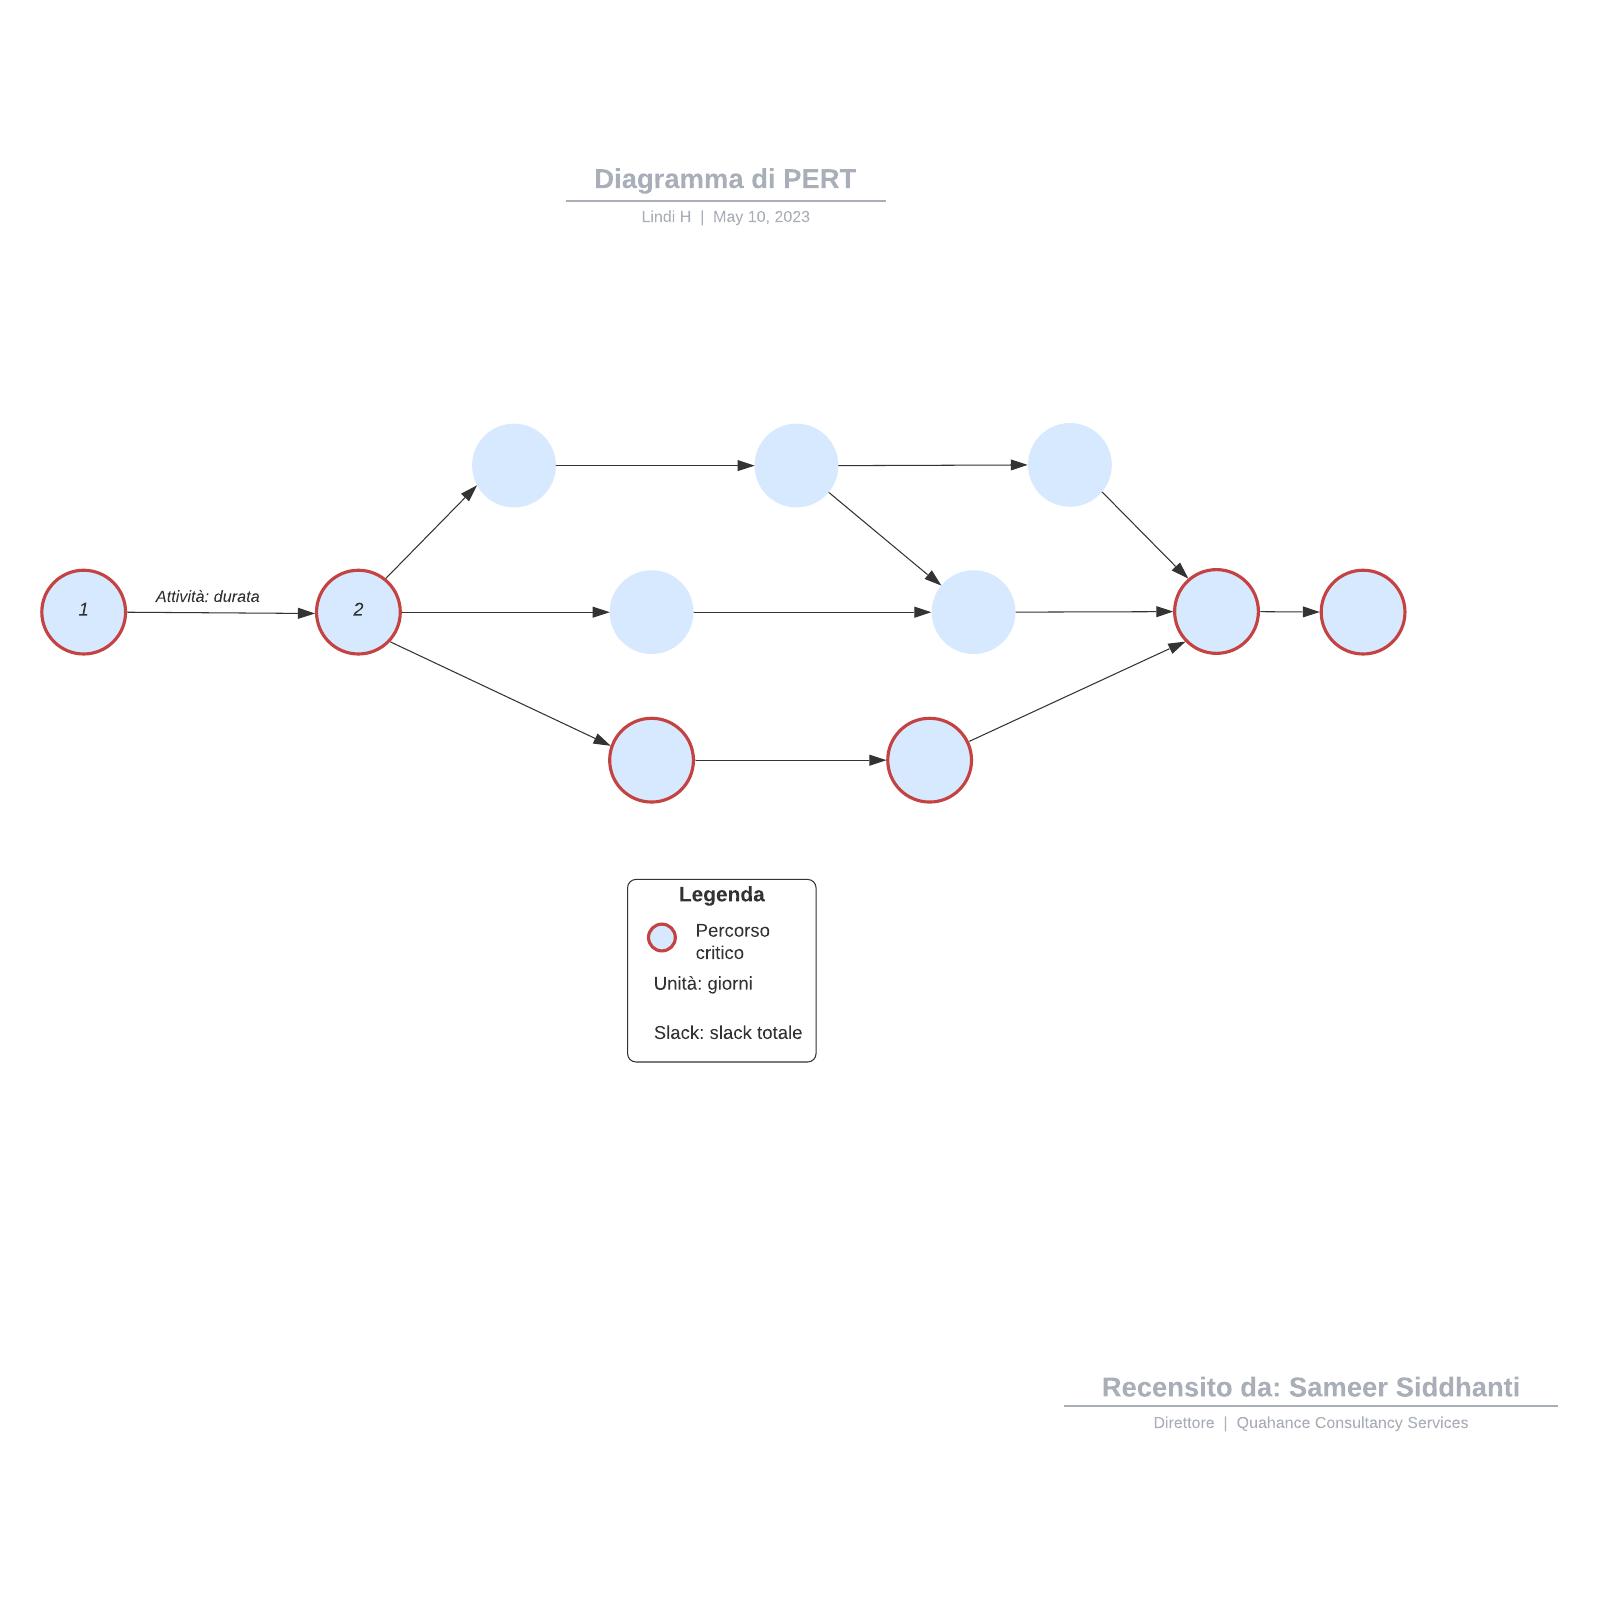 Diagramma di PERT